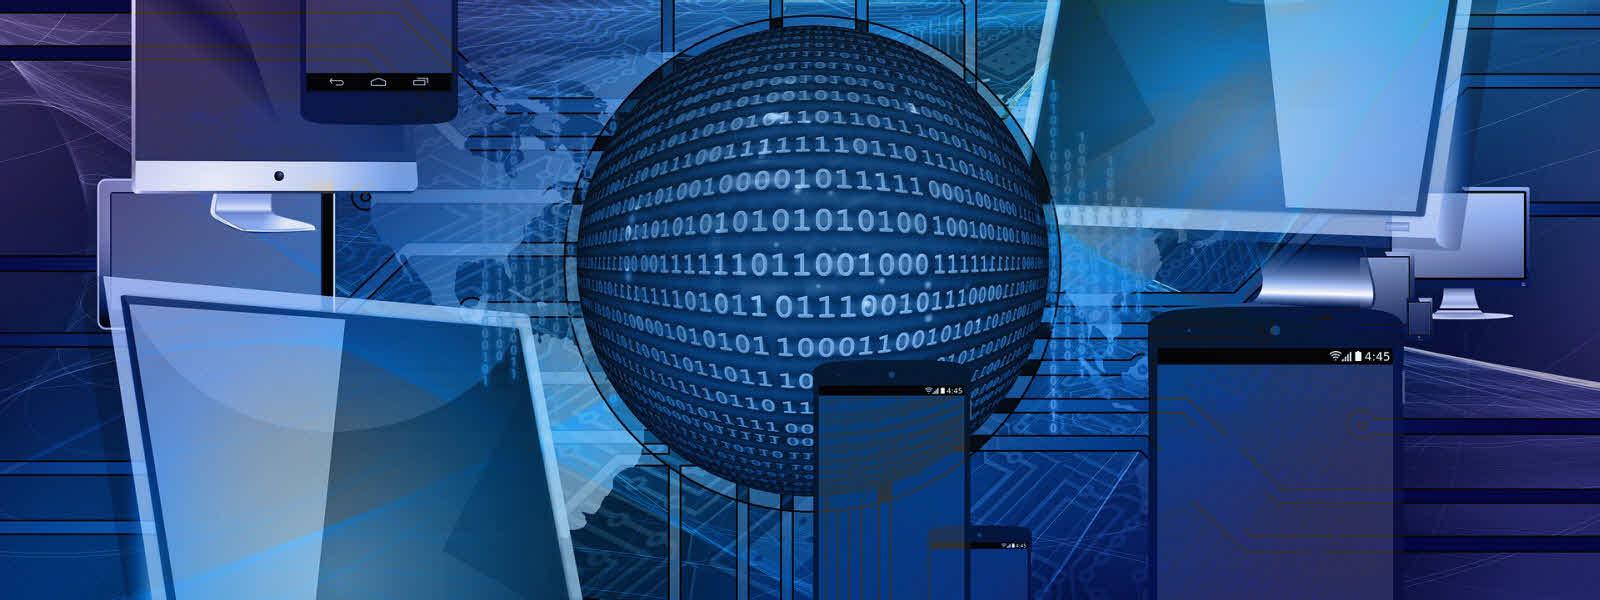 2018 Key Technologies that Help Drive Tech Distribution Growth